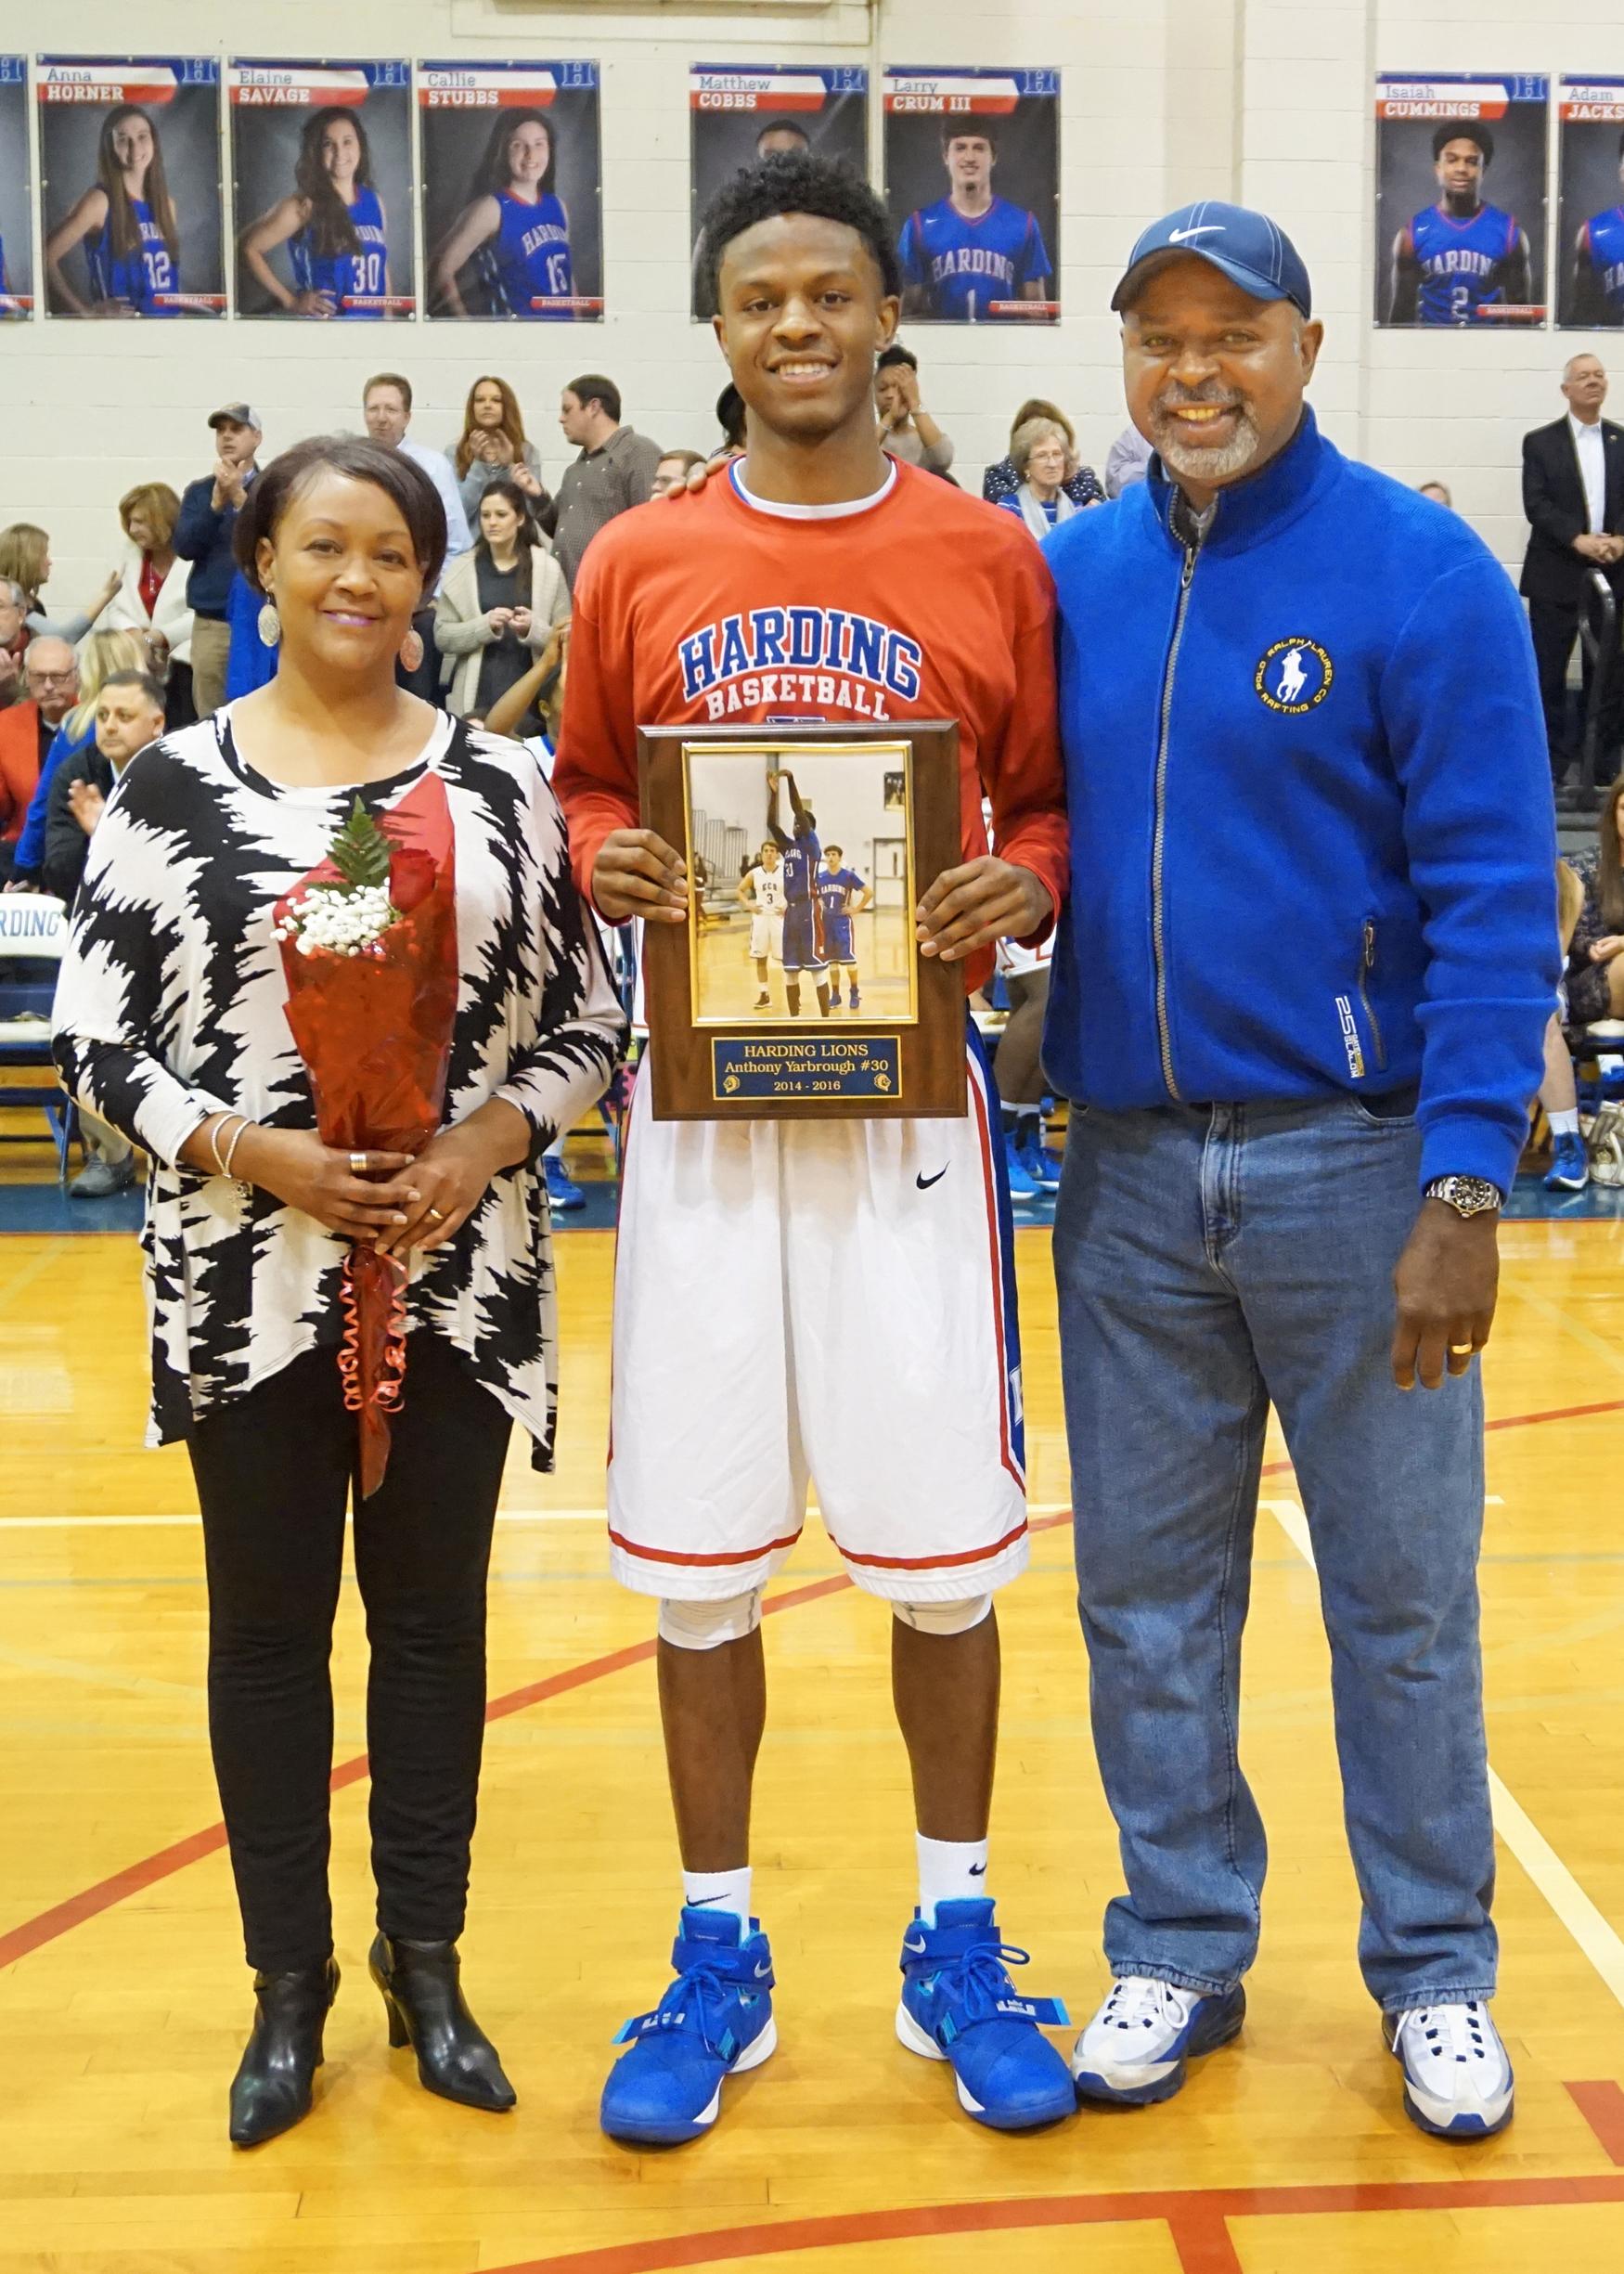 Feb12 SeniorNightBasketball15.jpg